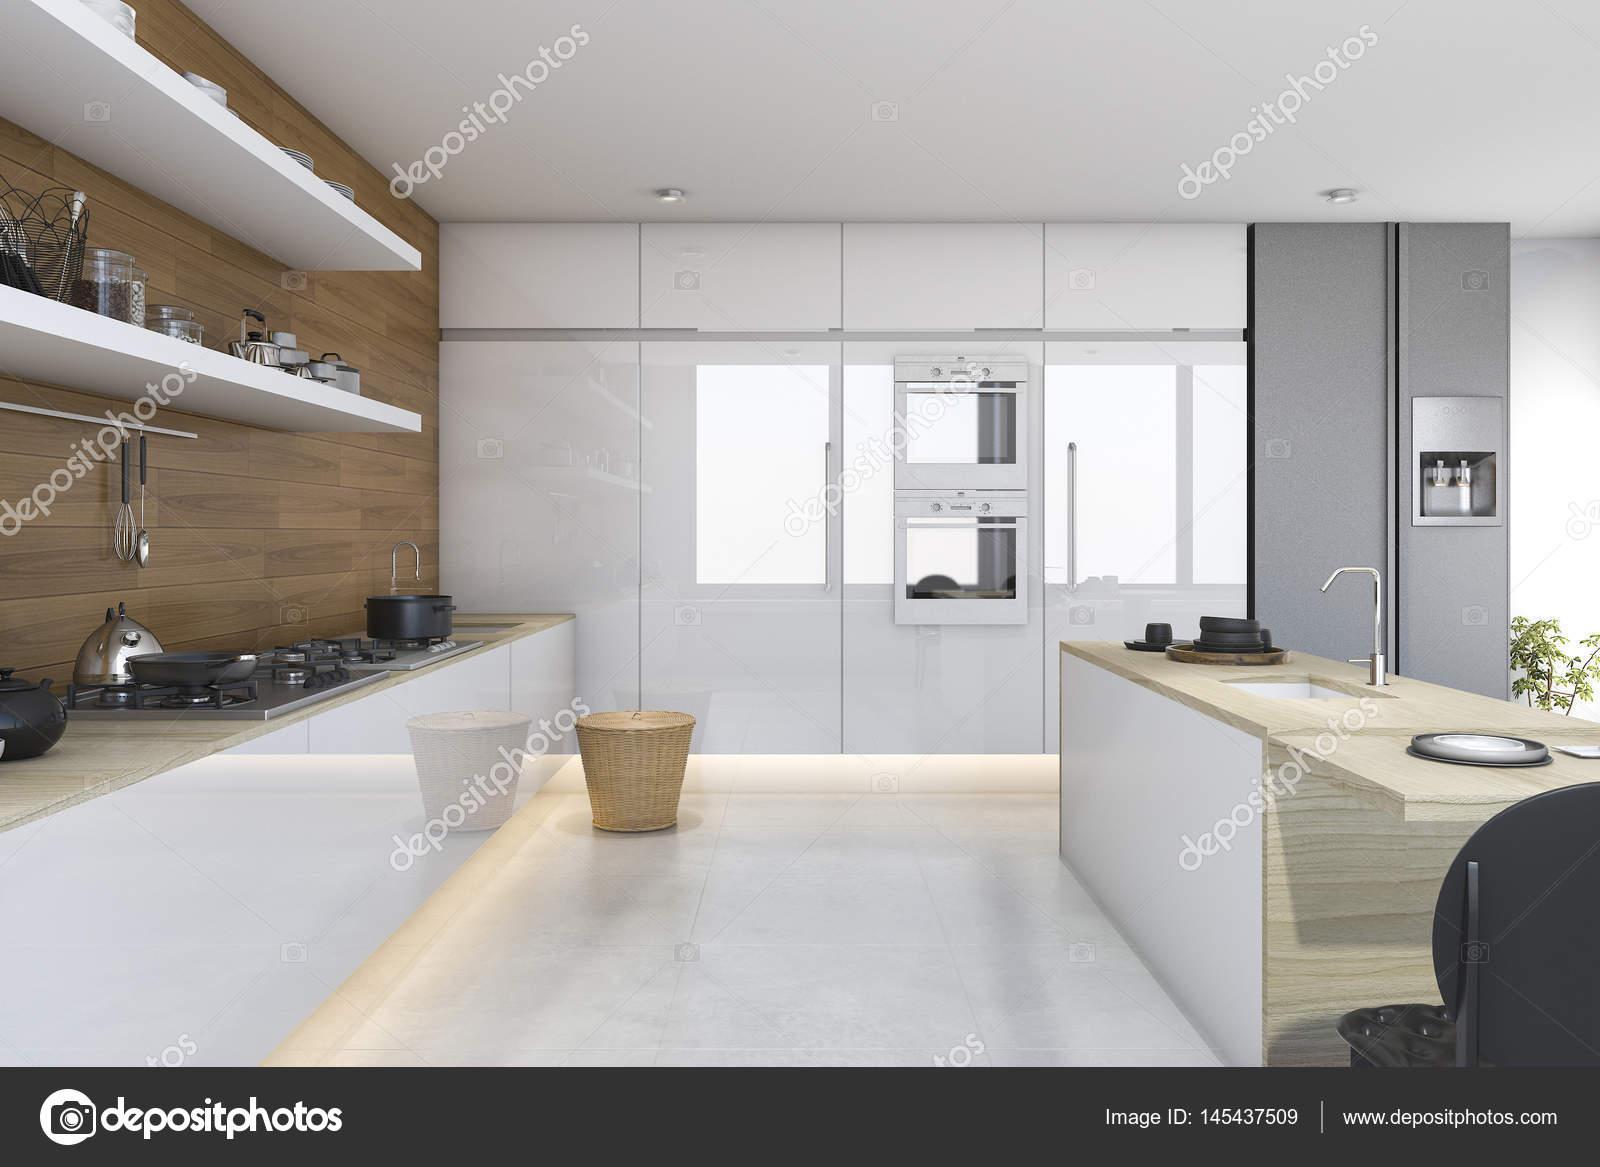 3D Render madera cocina con barra comedor — Foto de stock © dit26978 ...